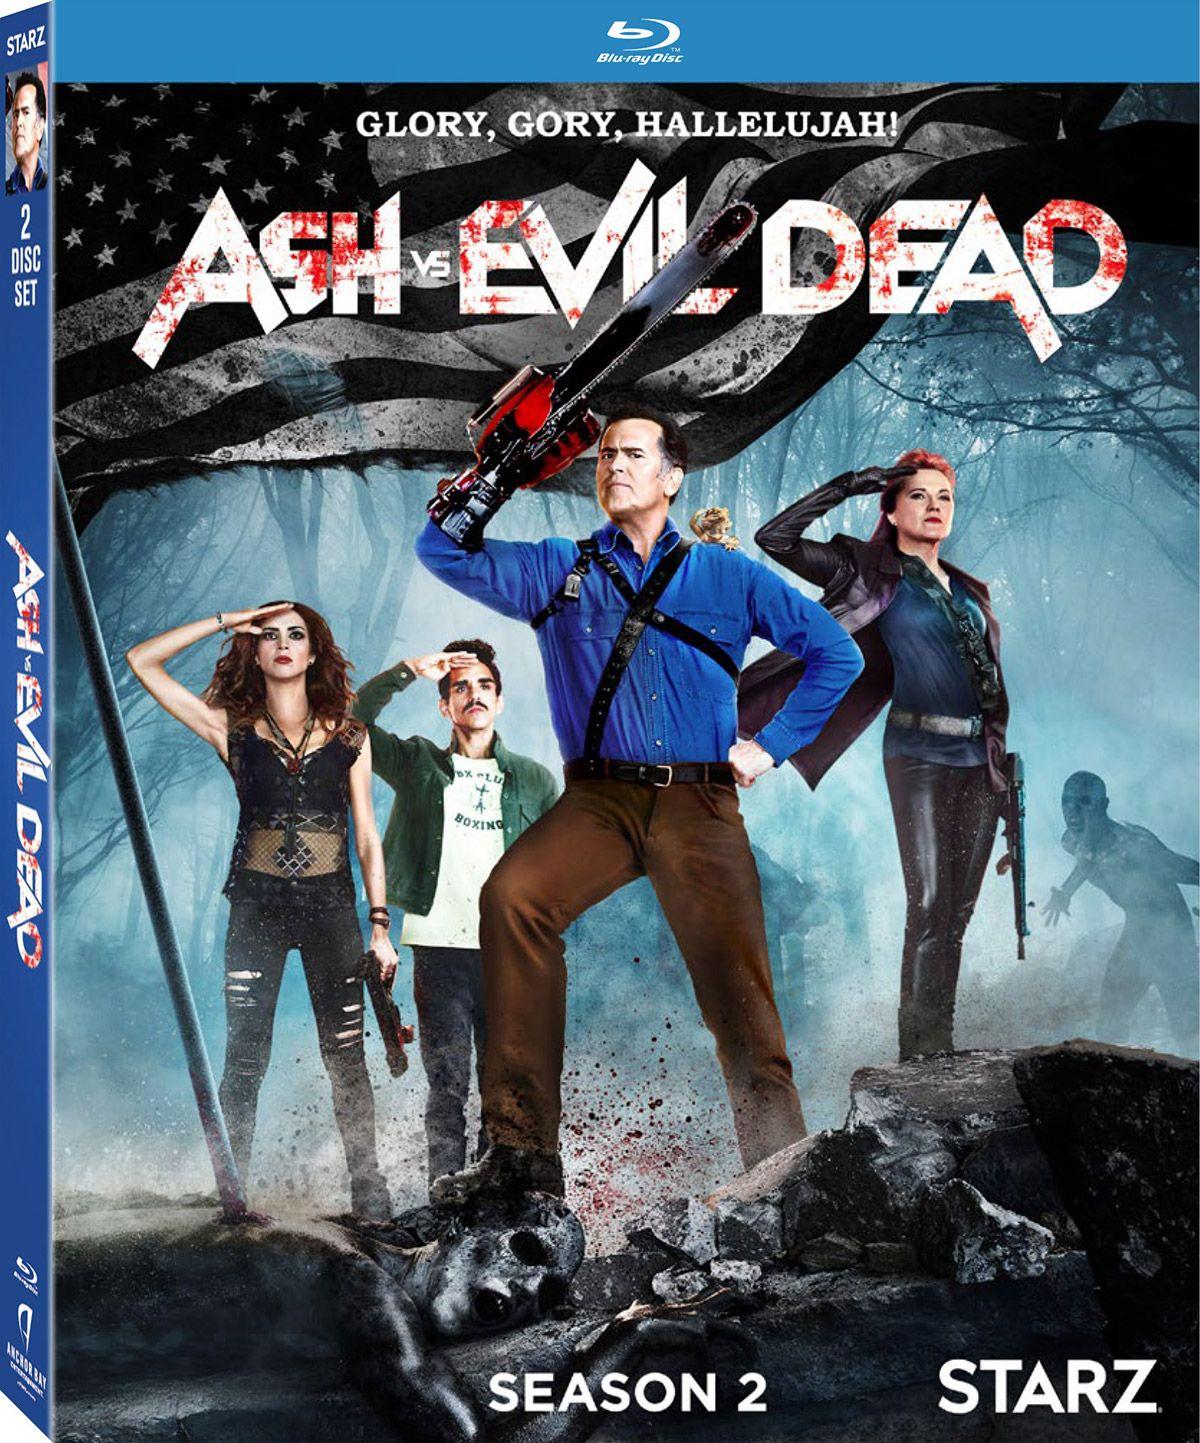 Ash Vs Evil Dead The Complete Second Season Blu Ray Review Evil Dead Series Dvd Seasons